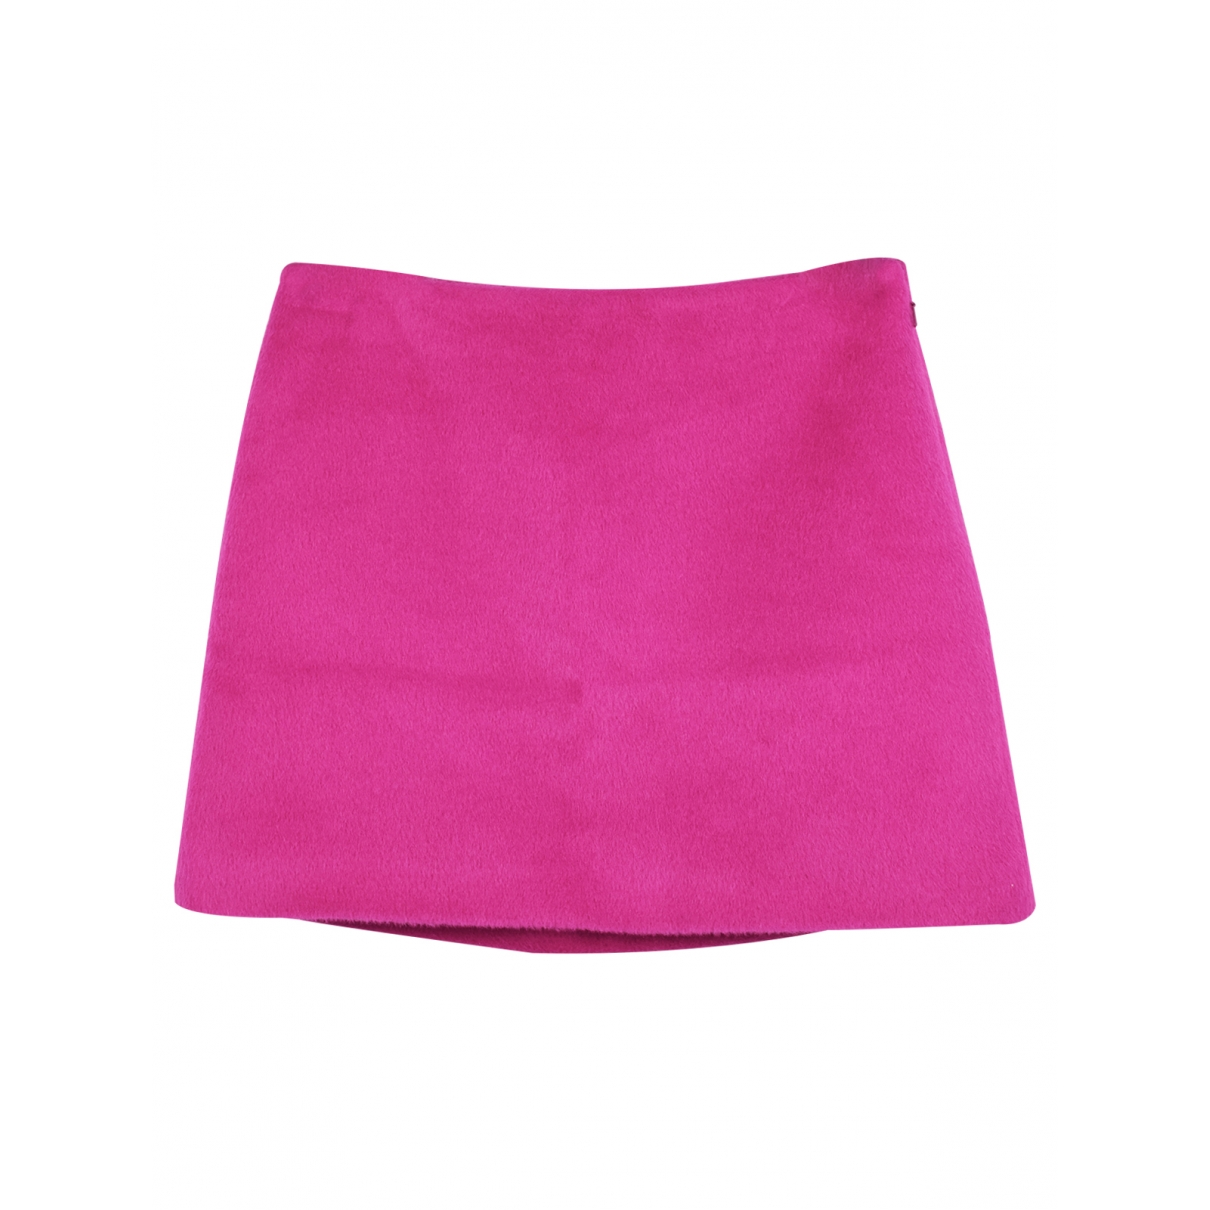 Helmut Lang - Jupe   pour femme en laine - rose